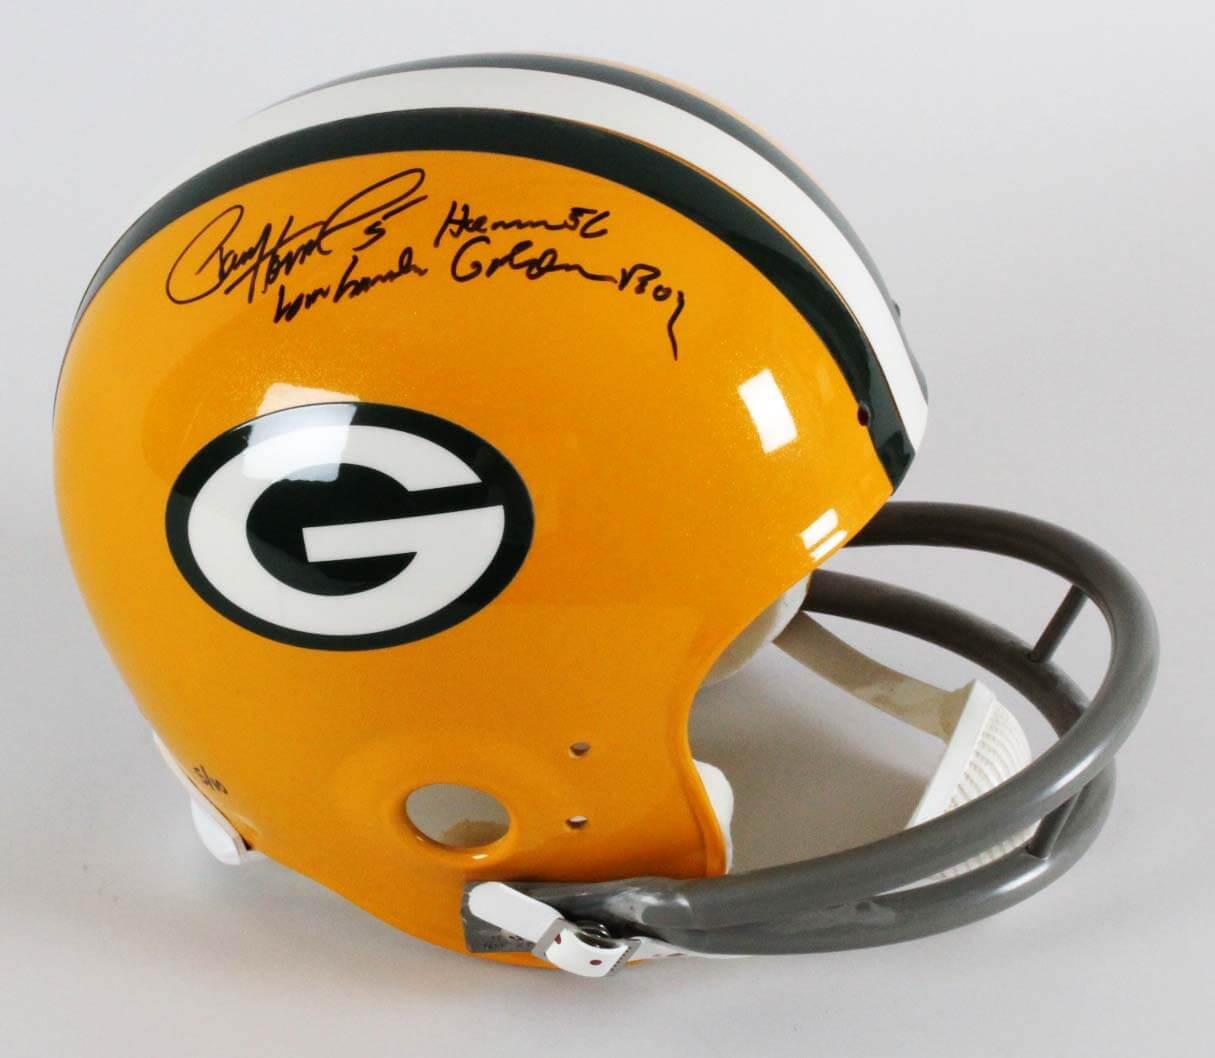 "Paul Hornung Signed Green Bay Packers Helmet - Full Size Inscribed,""Golden Boy, Heisman '56"" TriStar"